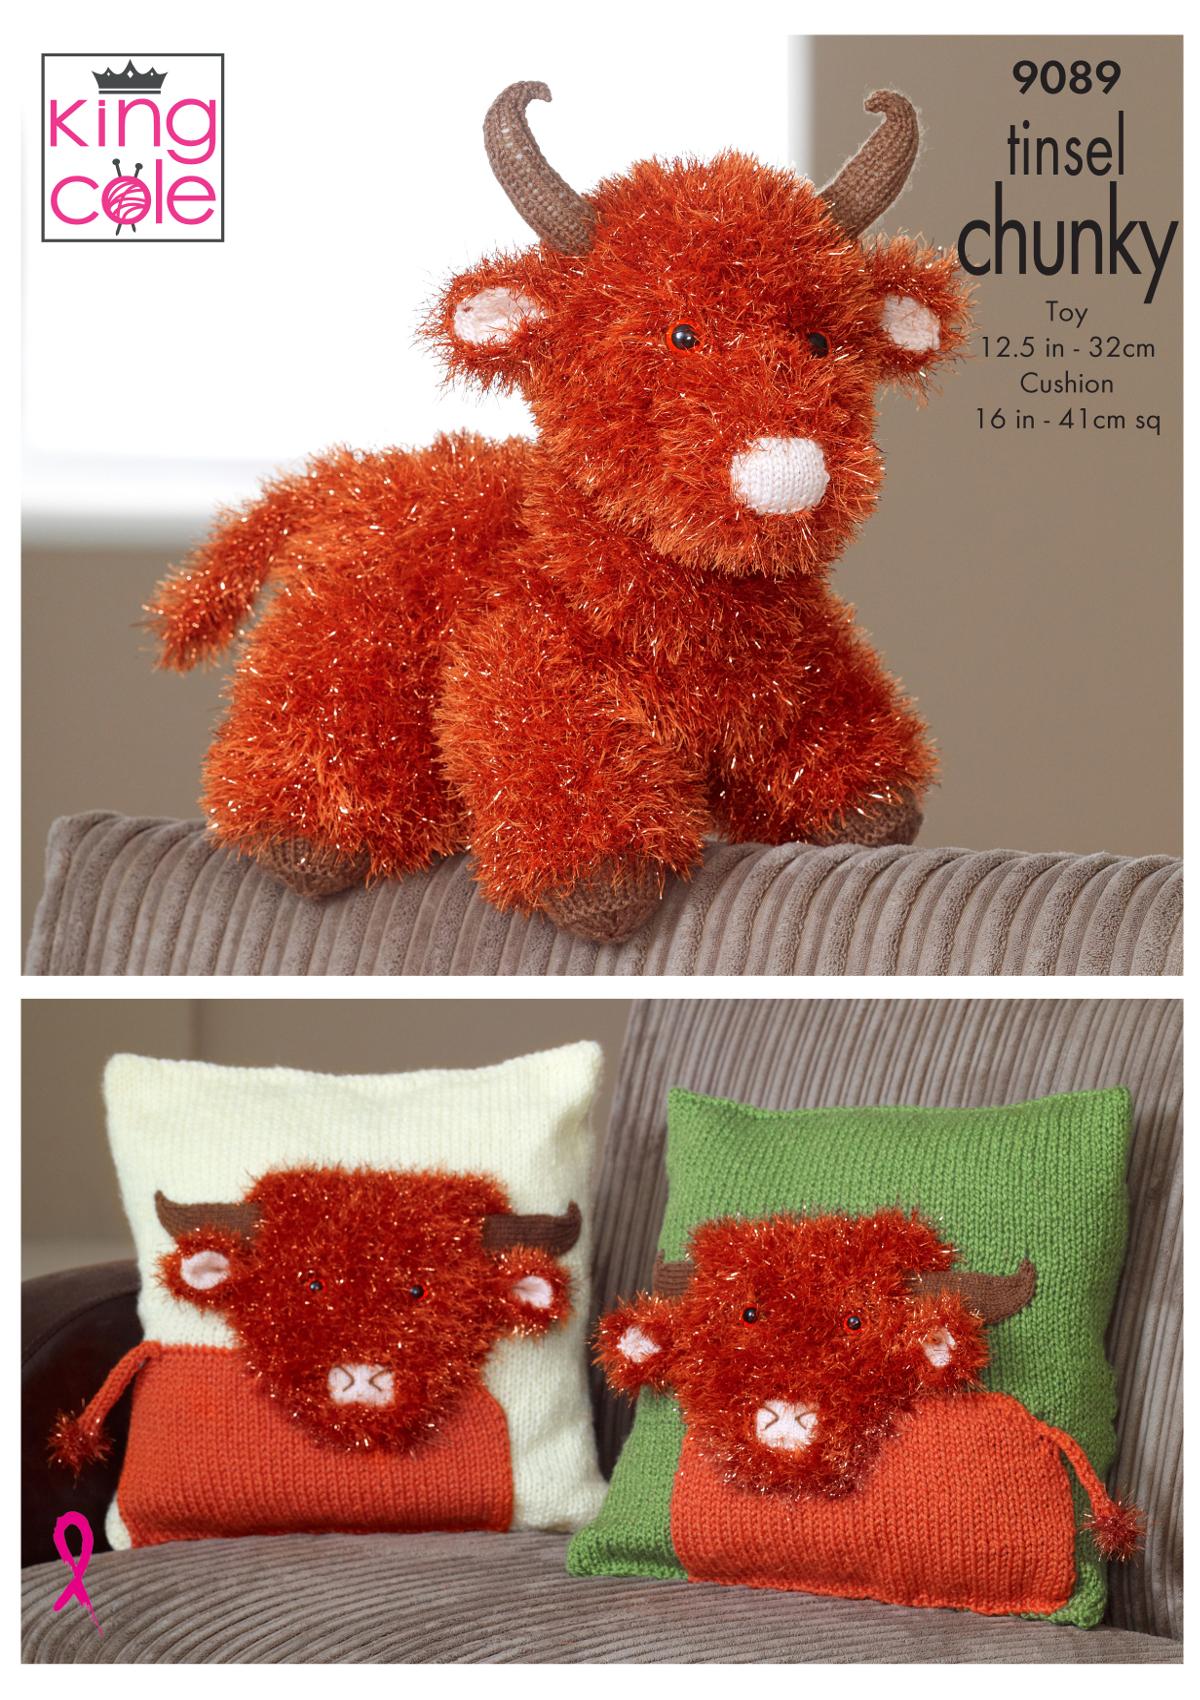 f0b4de1376c51 King Cole Tinsel Chunky Knitting Pattern Highland Cow Toy   Cushion ...